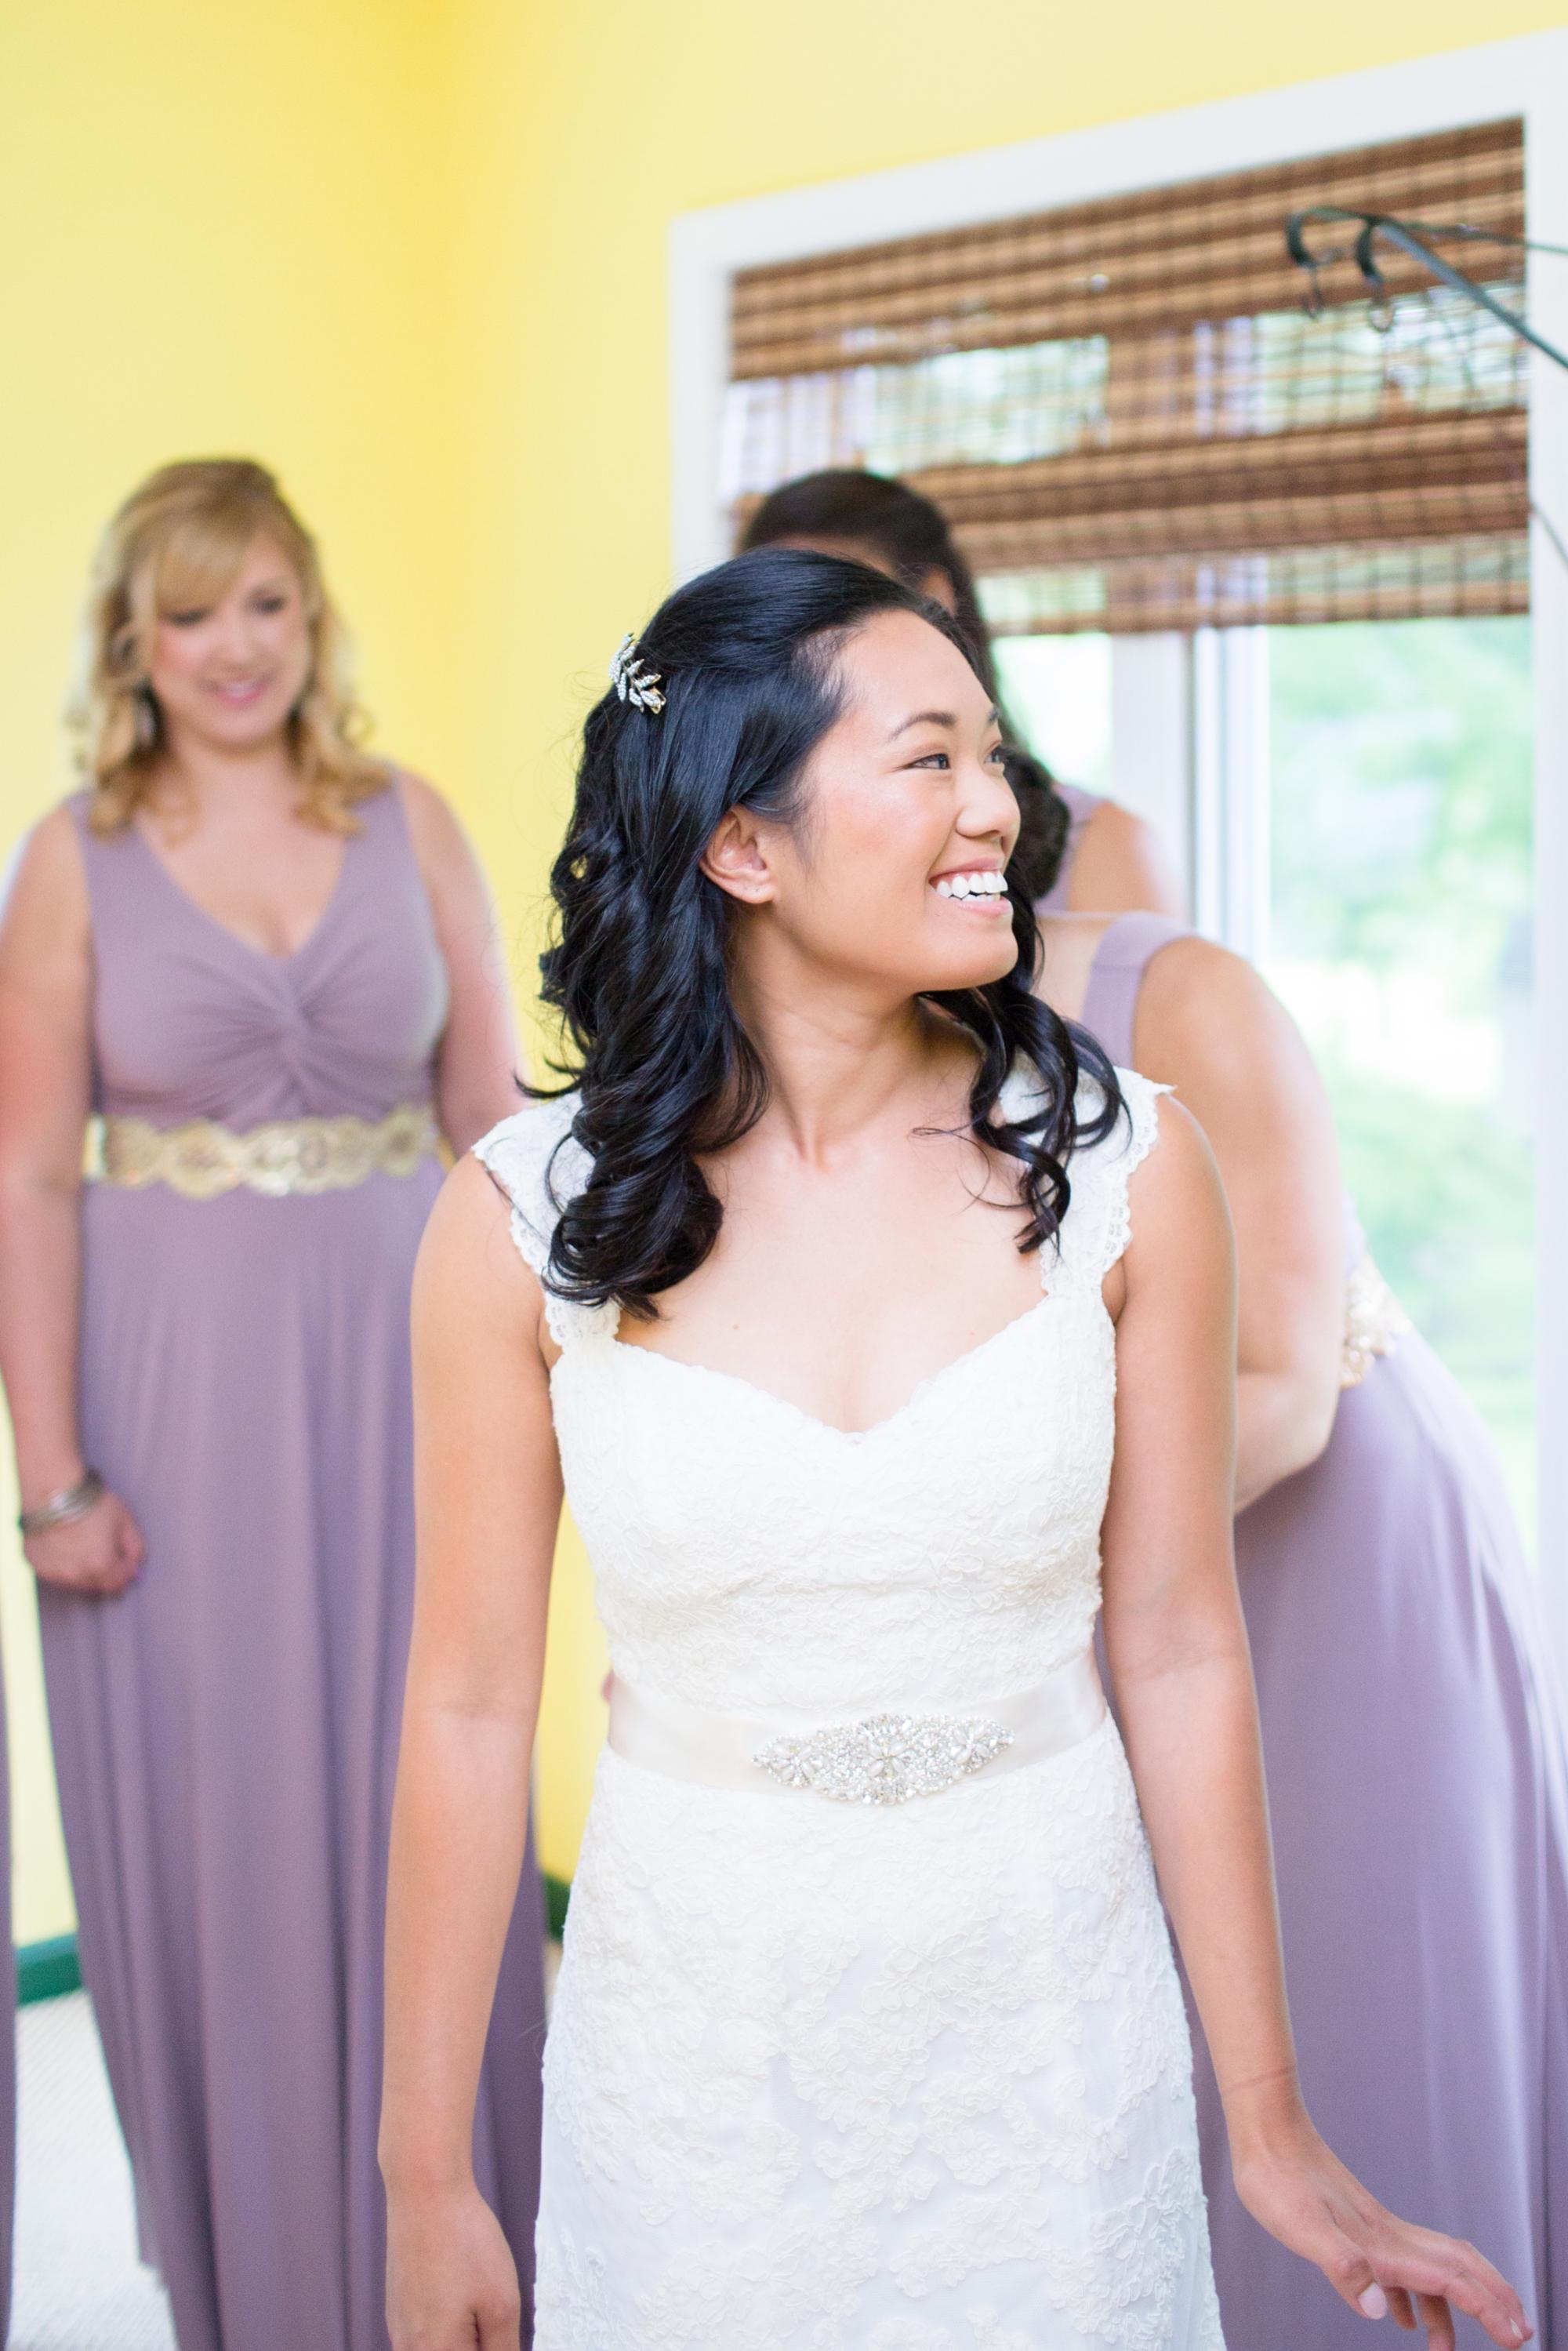 1-Hamby Wedding Getting Ready-124_annagracephotography maryland wedding photographer genesee valley.jpg